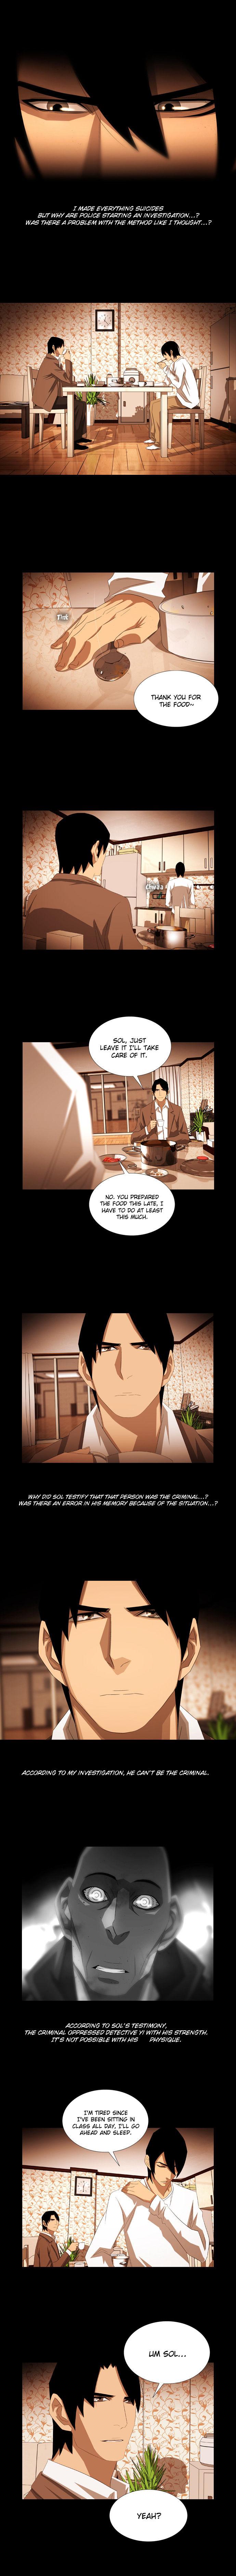 Marionette (WOO Kang-Sik) 23 Page 3